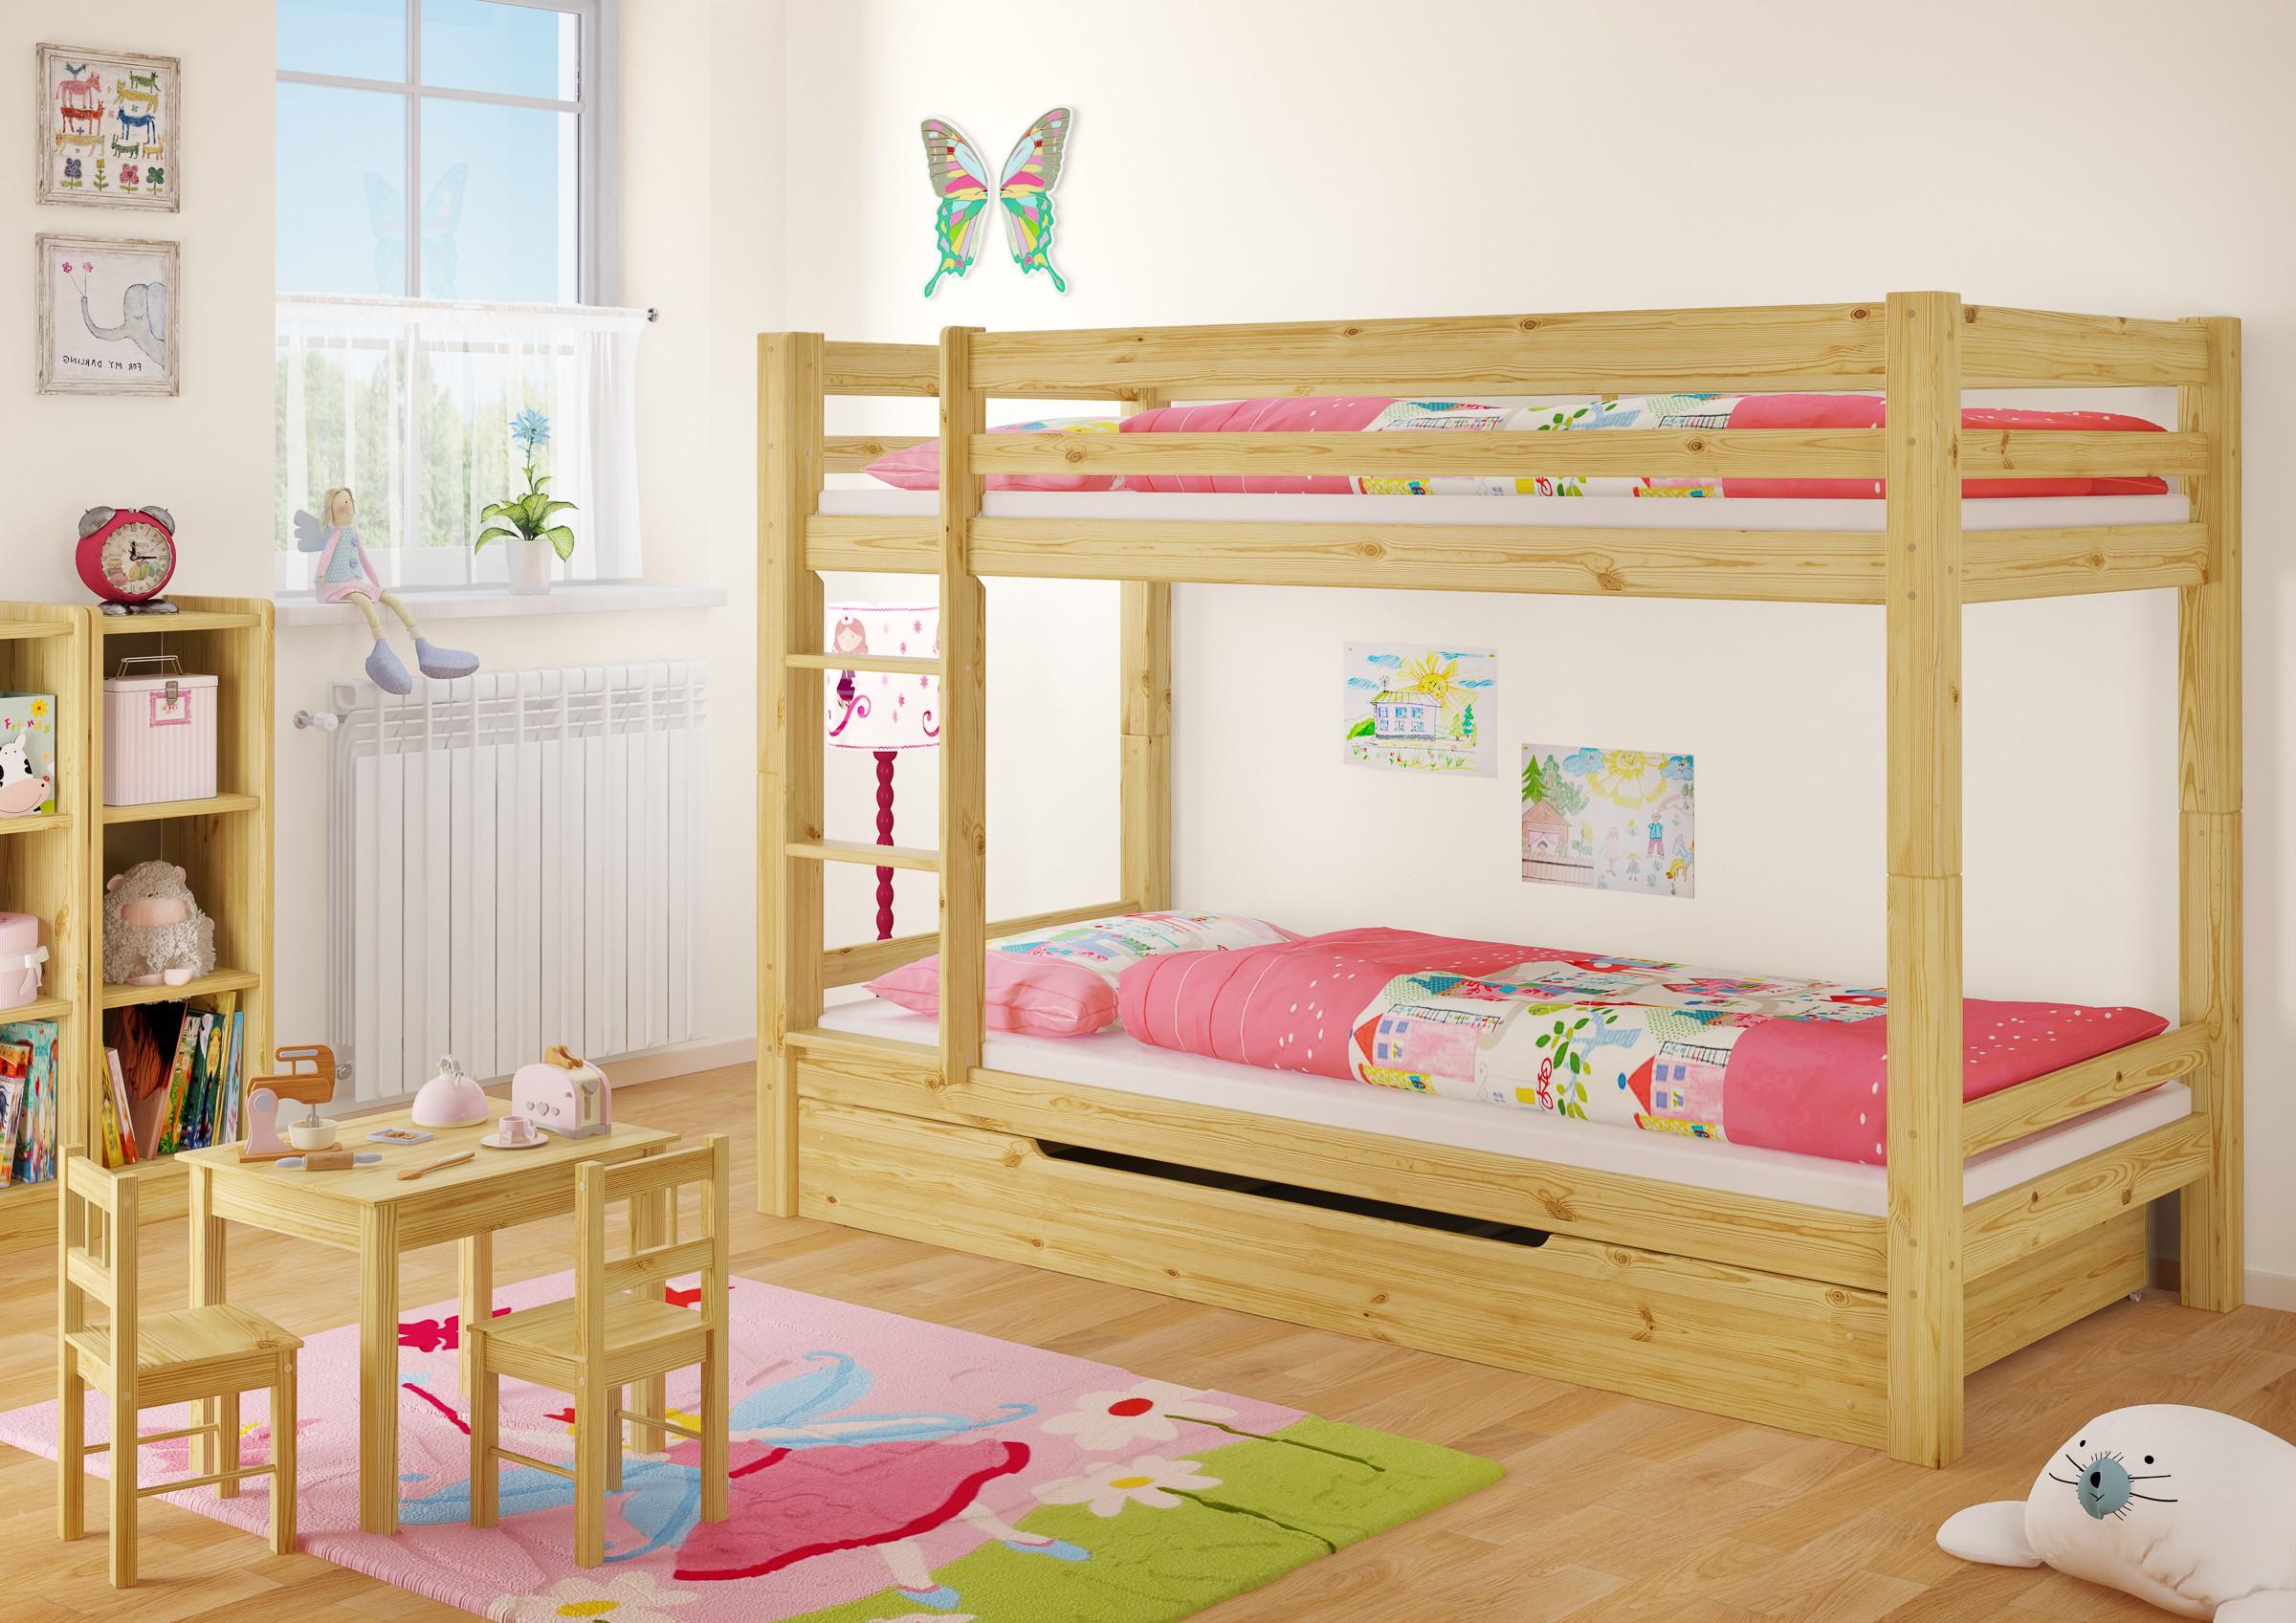 kinderstockbett mit bettkasten kiefer matratze 90x200 kinderbett m s1 4250639500983 ebay. Black Bedroom Furniture Sets. Home Design Ideas